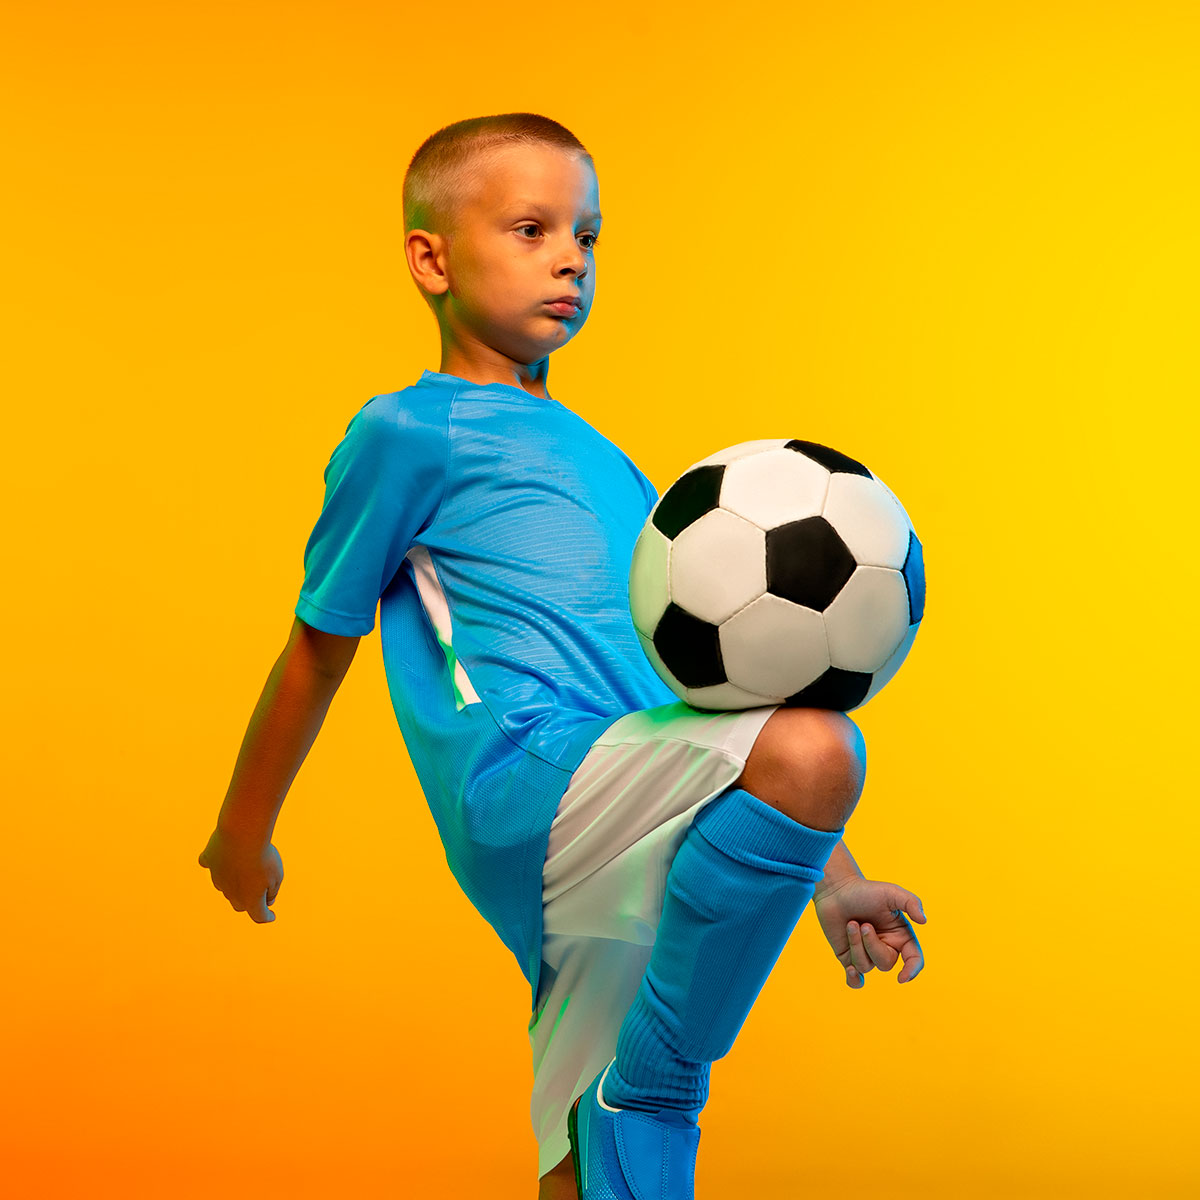 Torneo Futbol Free Style